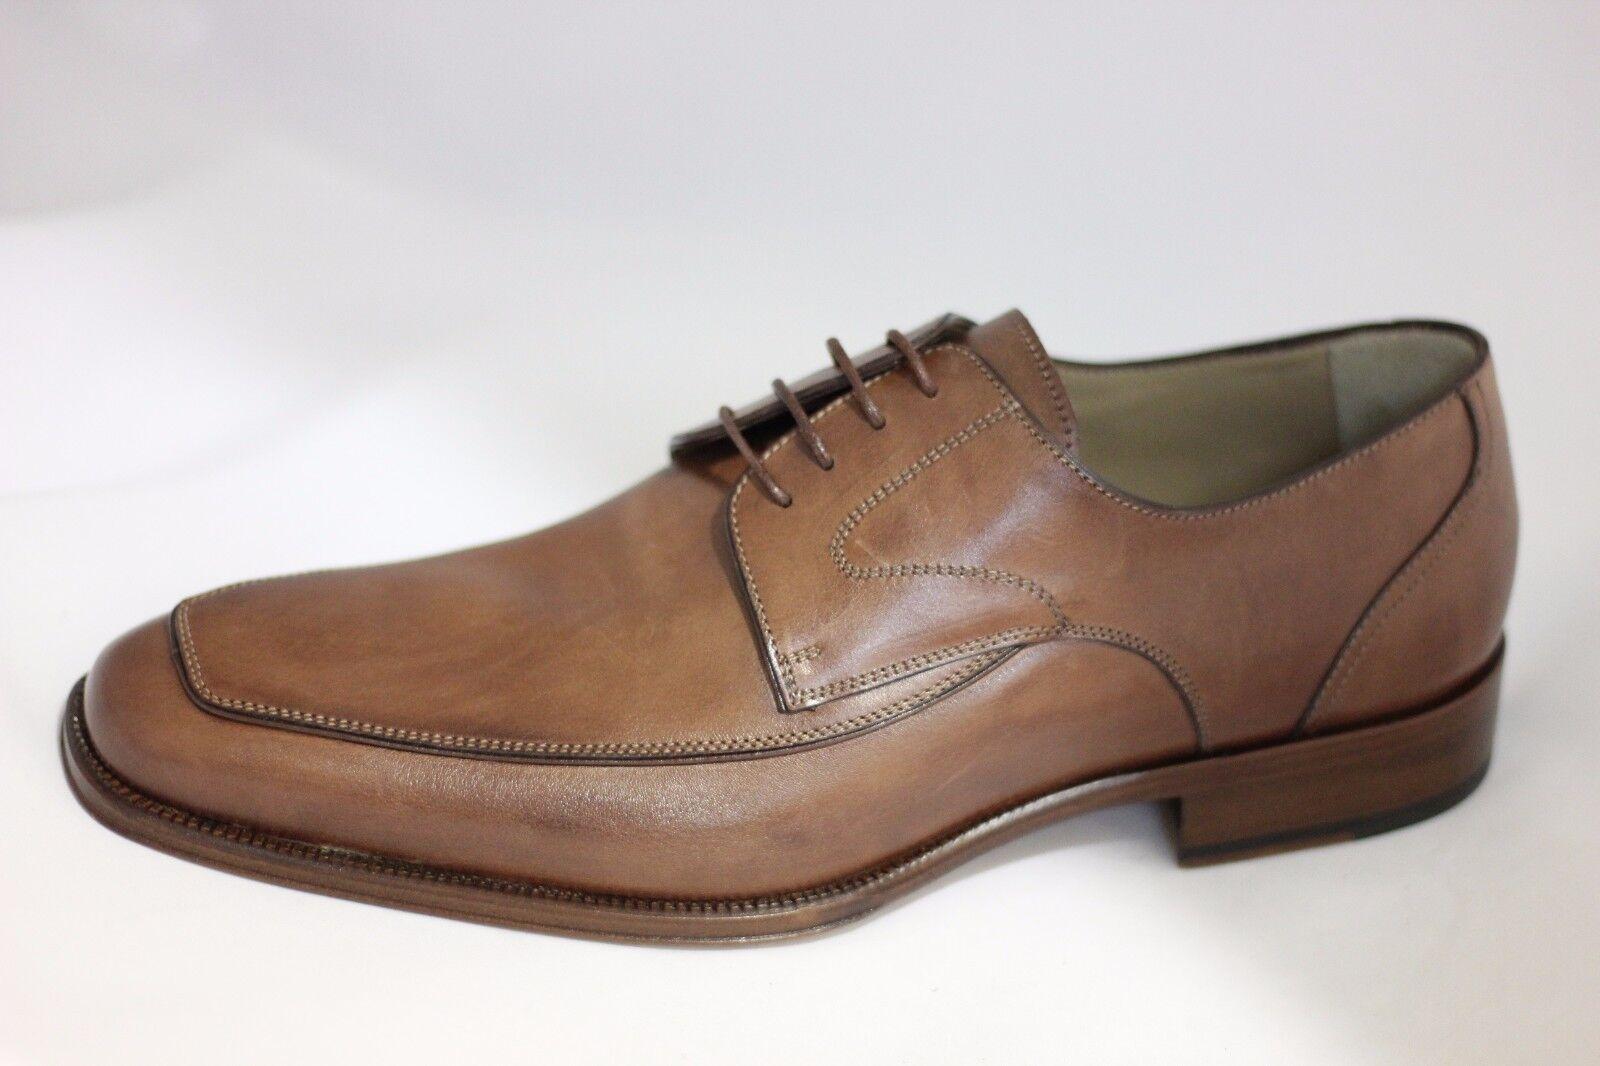 Scarpa marrone elegante stringhe uomo pelle marrone Scarpa REDWOOD 42 outlet sconto 50% 87e160